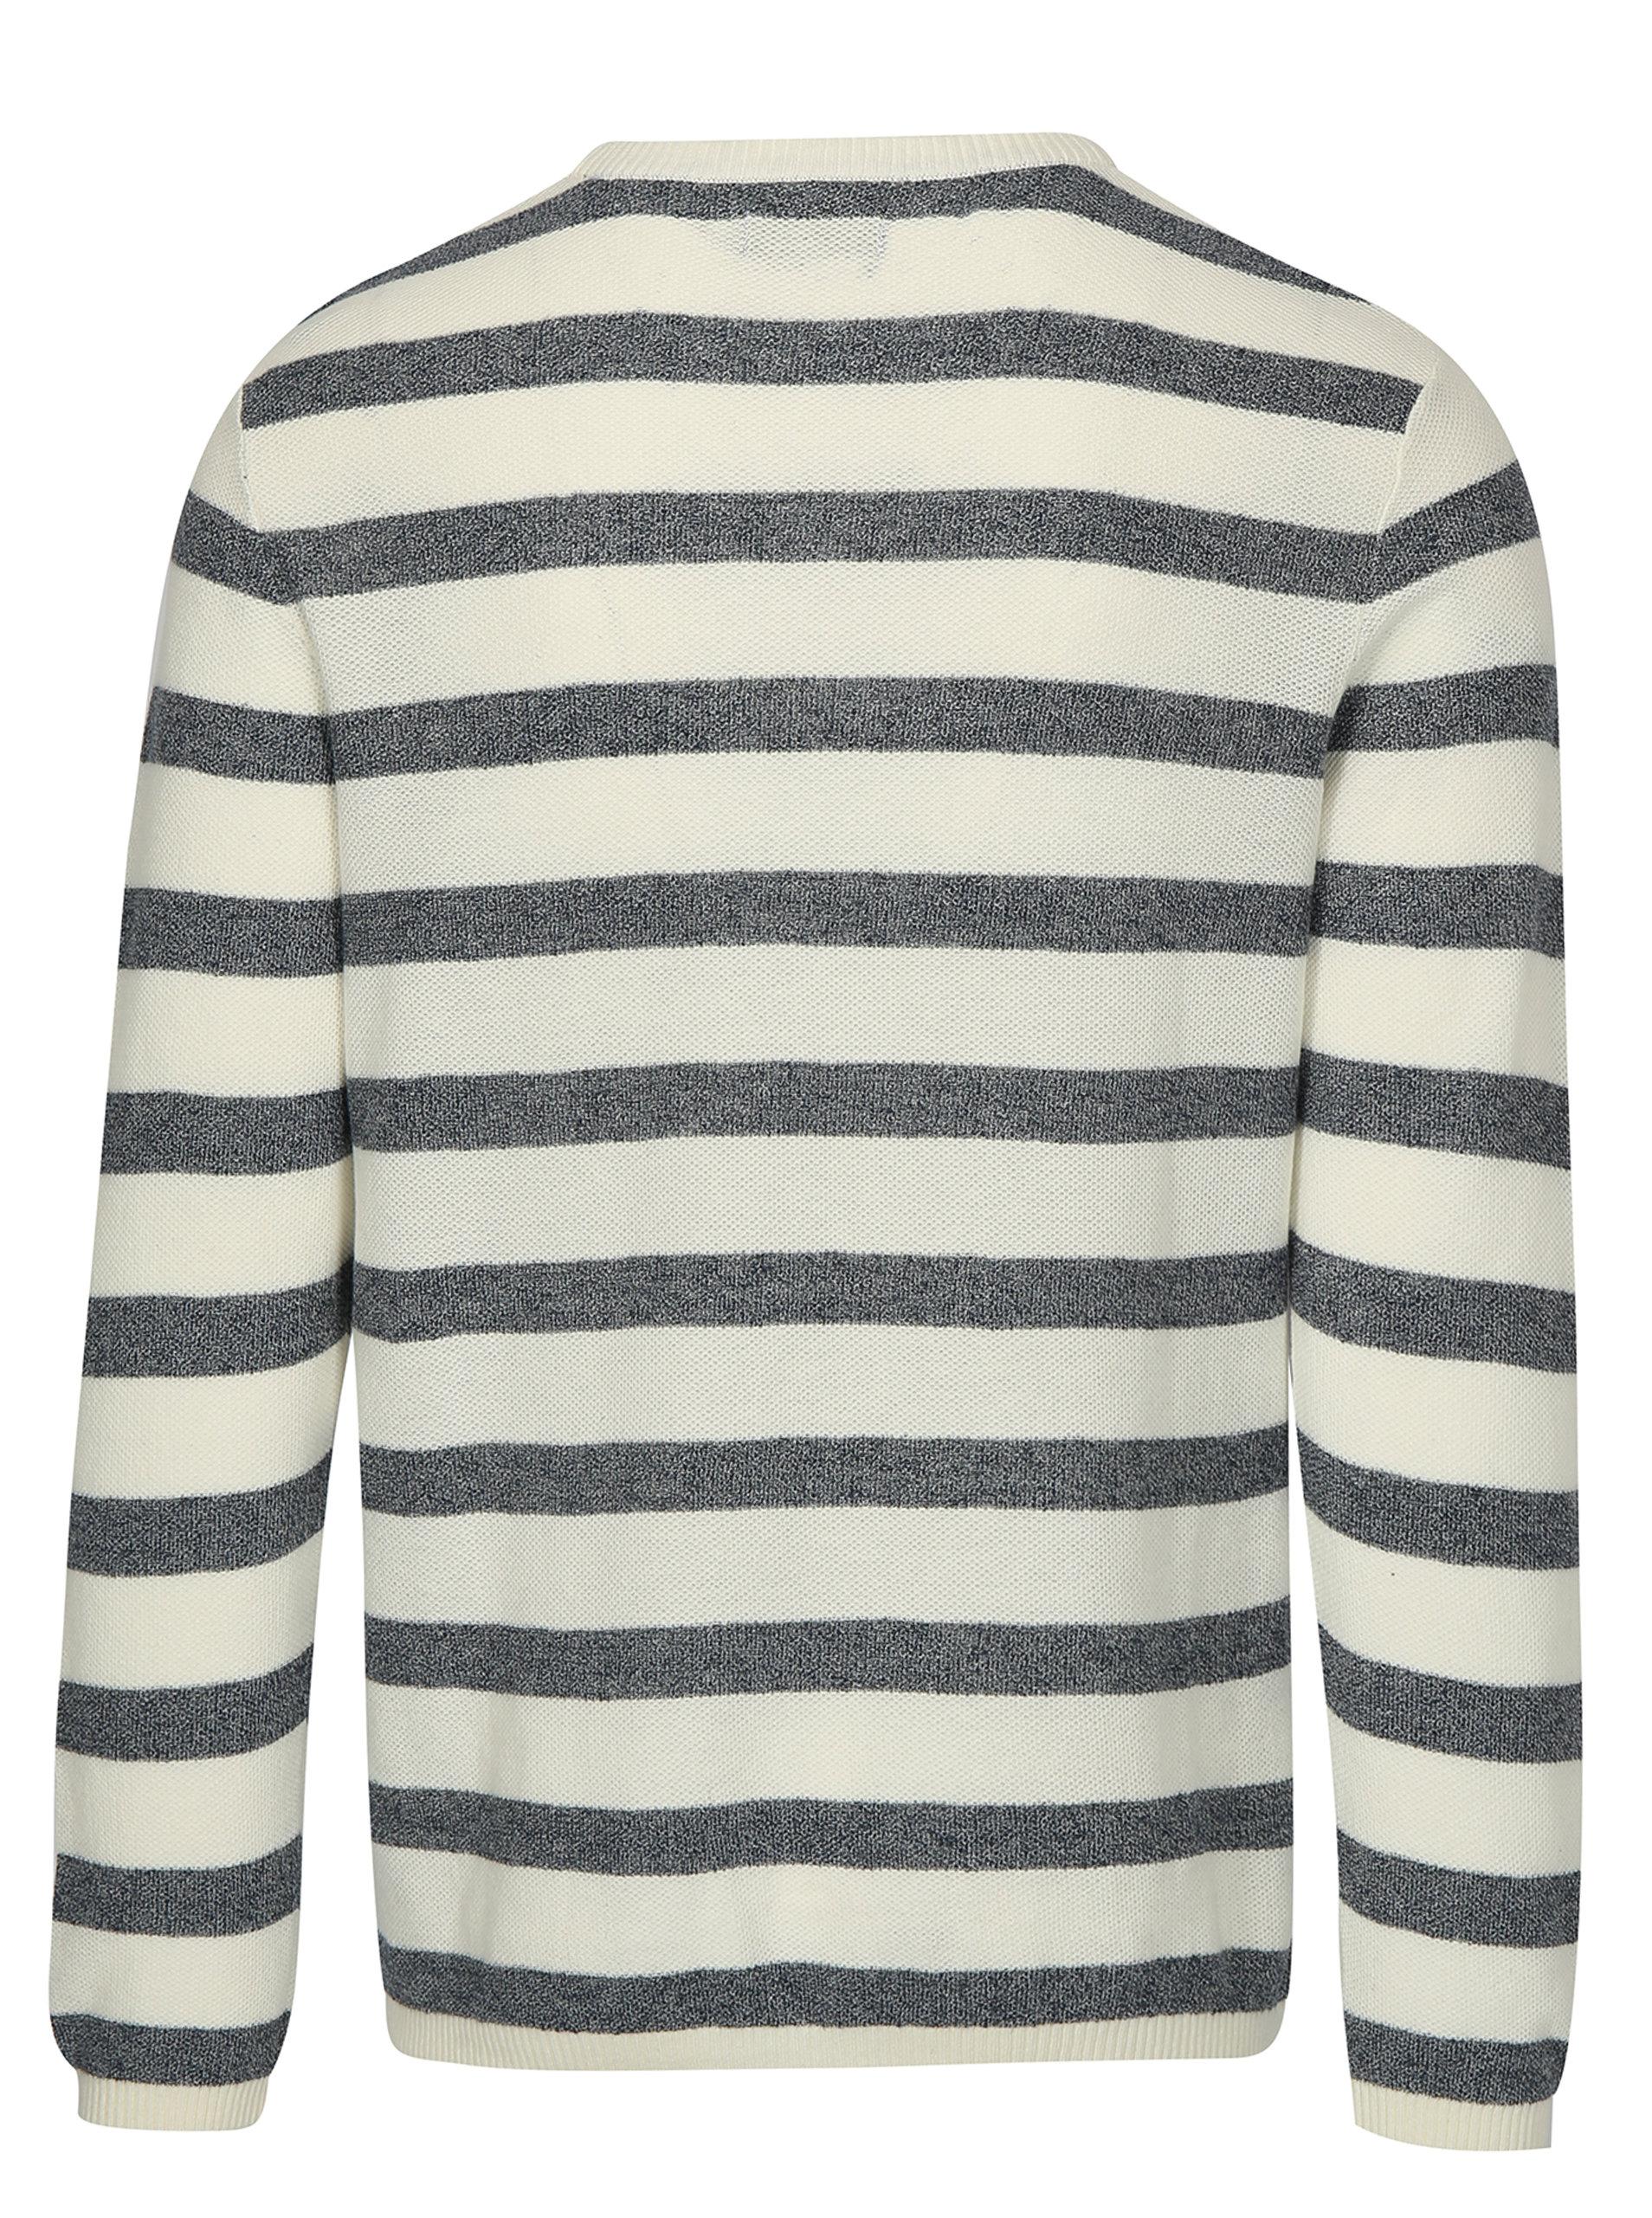 b74ba9627bdc Modro-krémový pruhovaný sveter s prímesou ľanu Jack   Jones Originals  Orlito ...